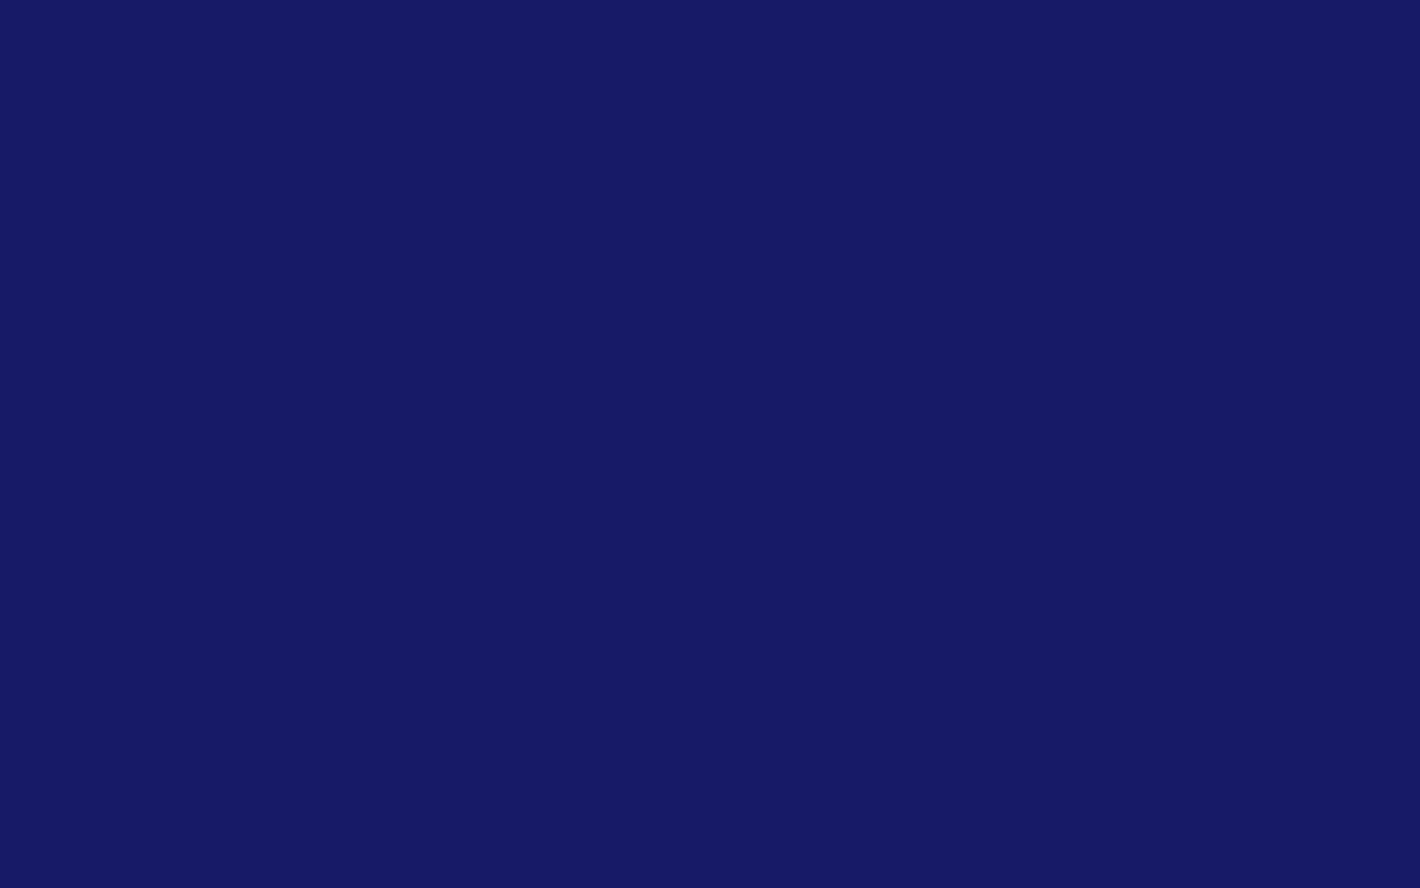 este amor es azul.jpg